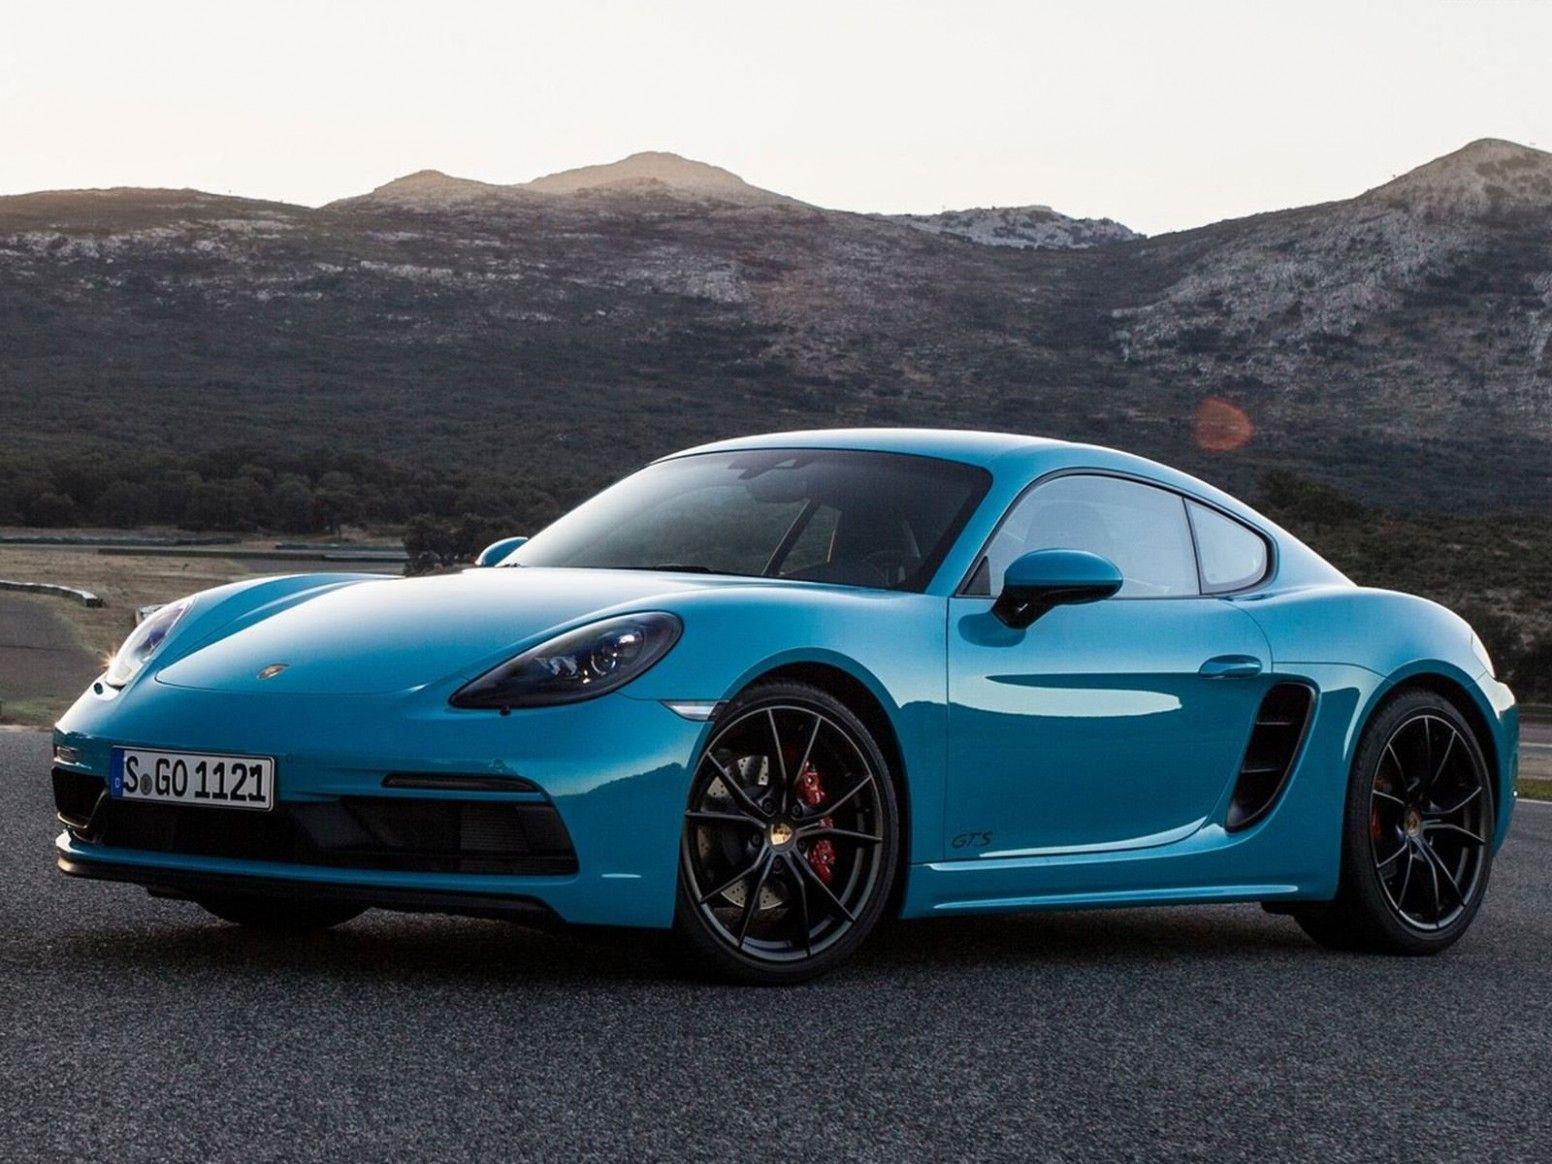 2021 The Porsche 718 Release Date